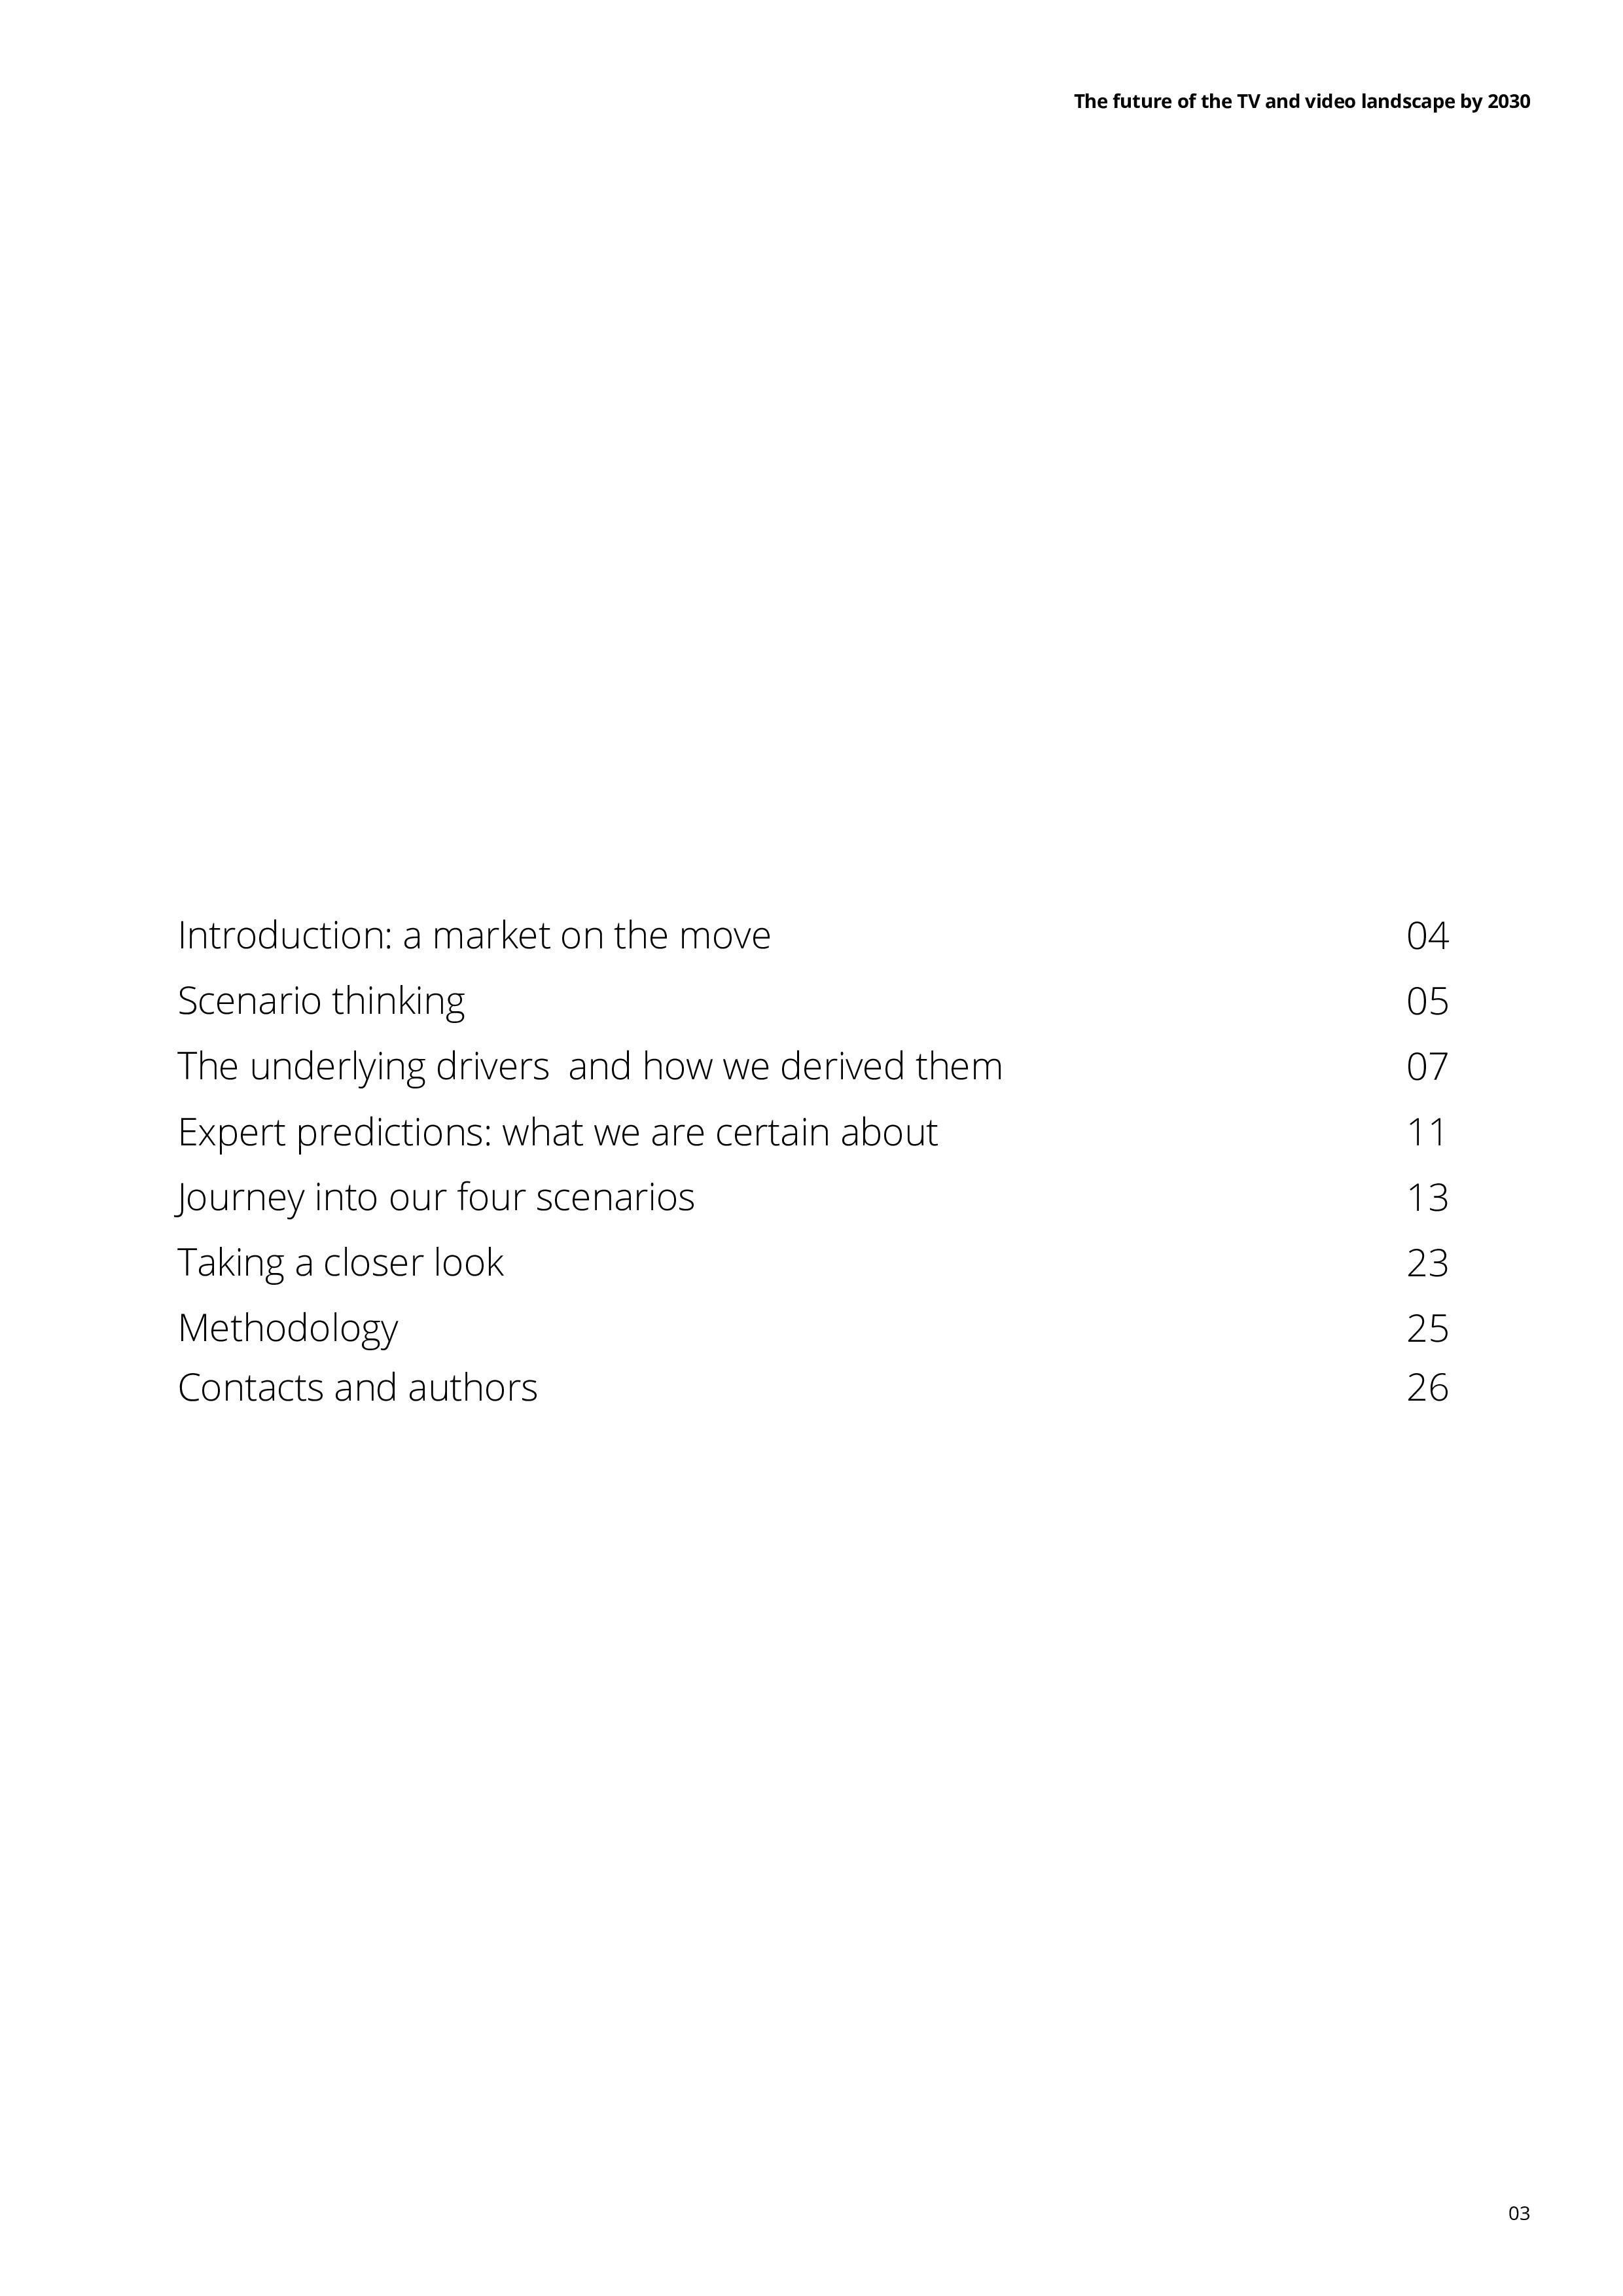 德勤咨询:电视和视频的未来2023